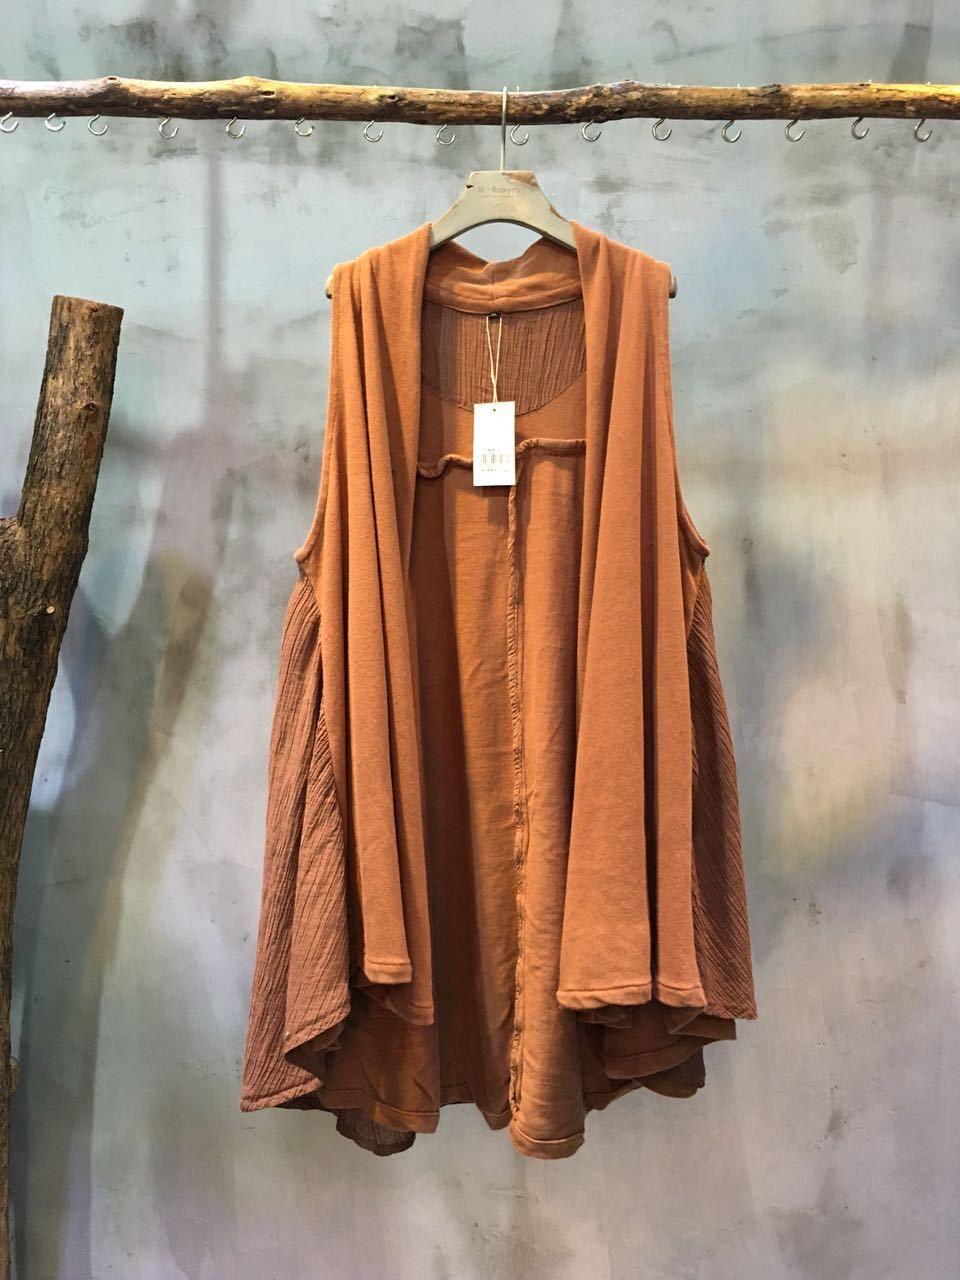 Mori Girl Patchwork Ruffled Waistcoat Khaki Cardigan  #khaki #cardigan #ruffle #patchwork #coat #outerwear